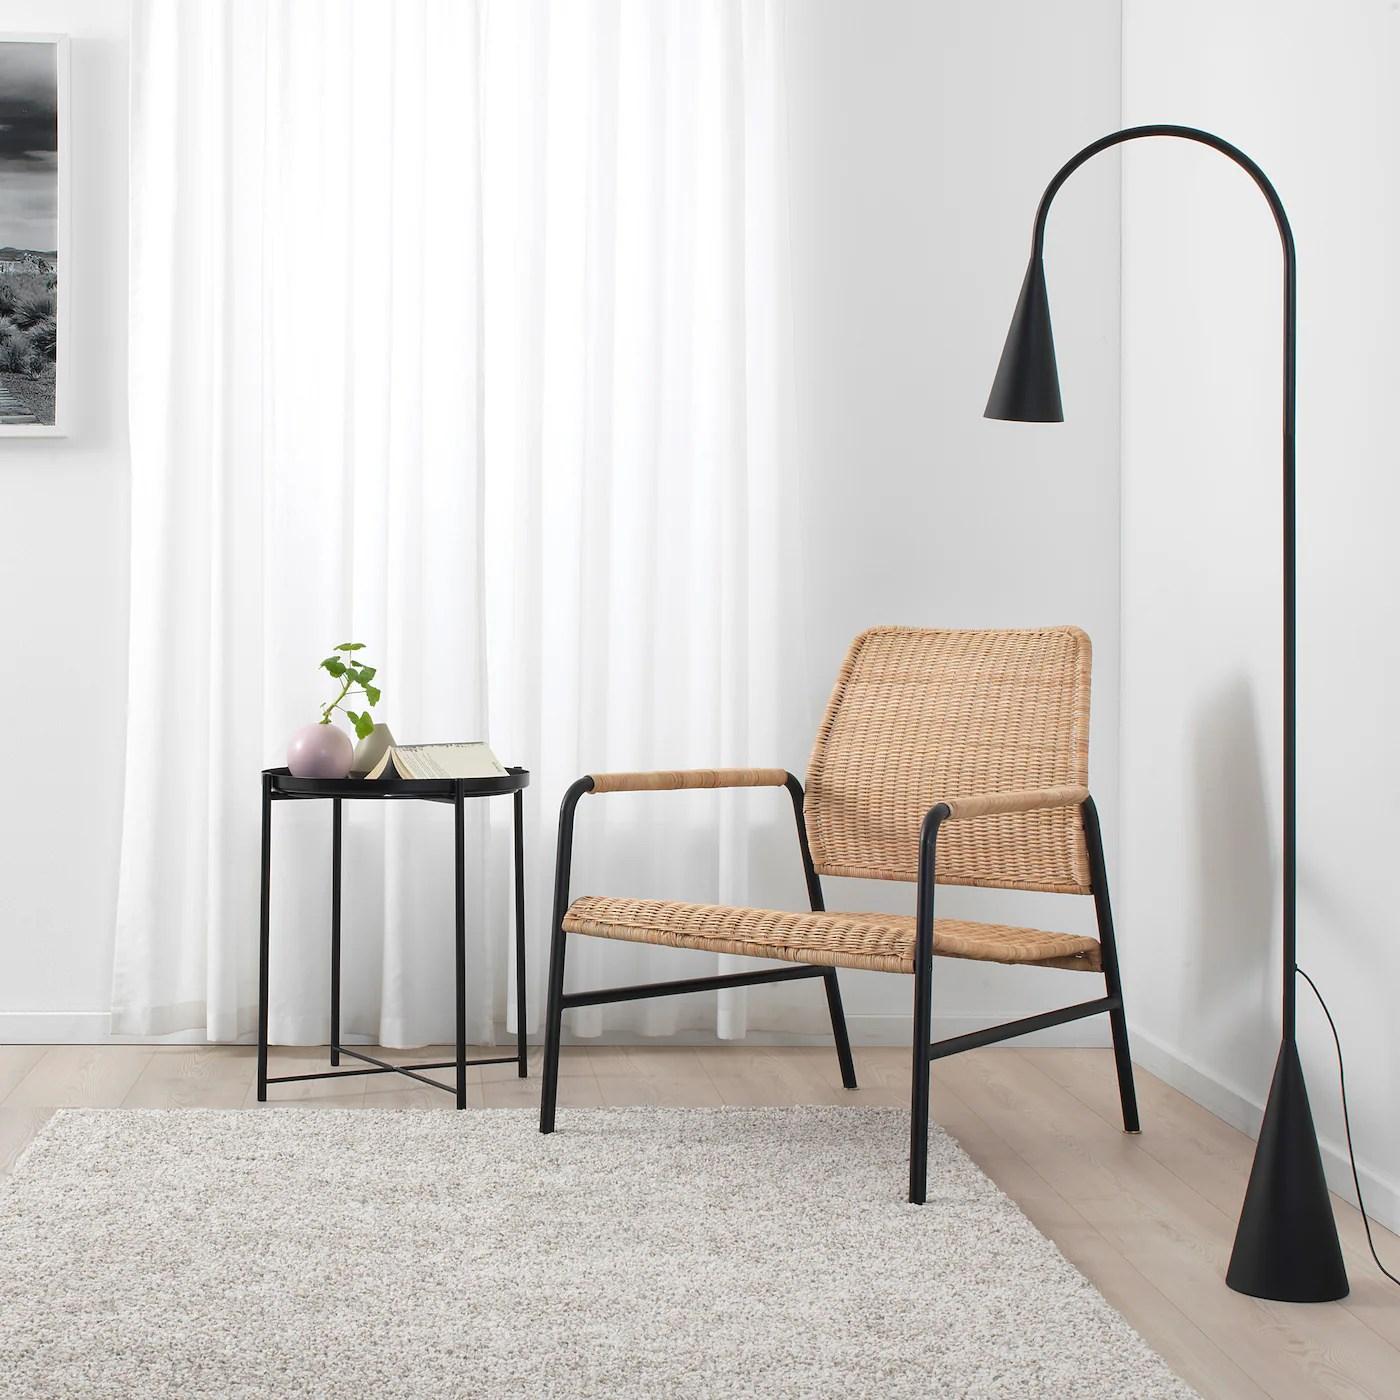 ulriksberg fauteuil rotin anthracite